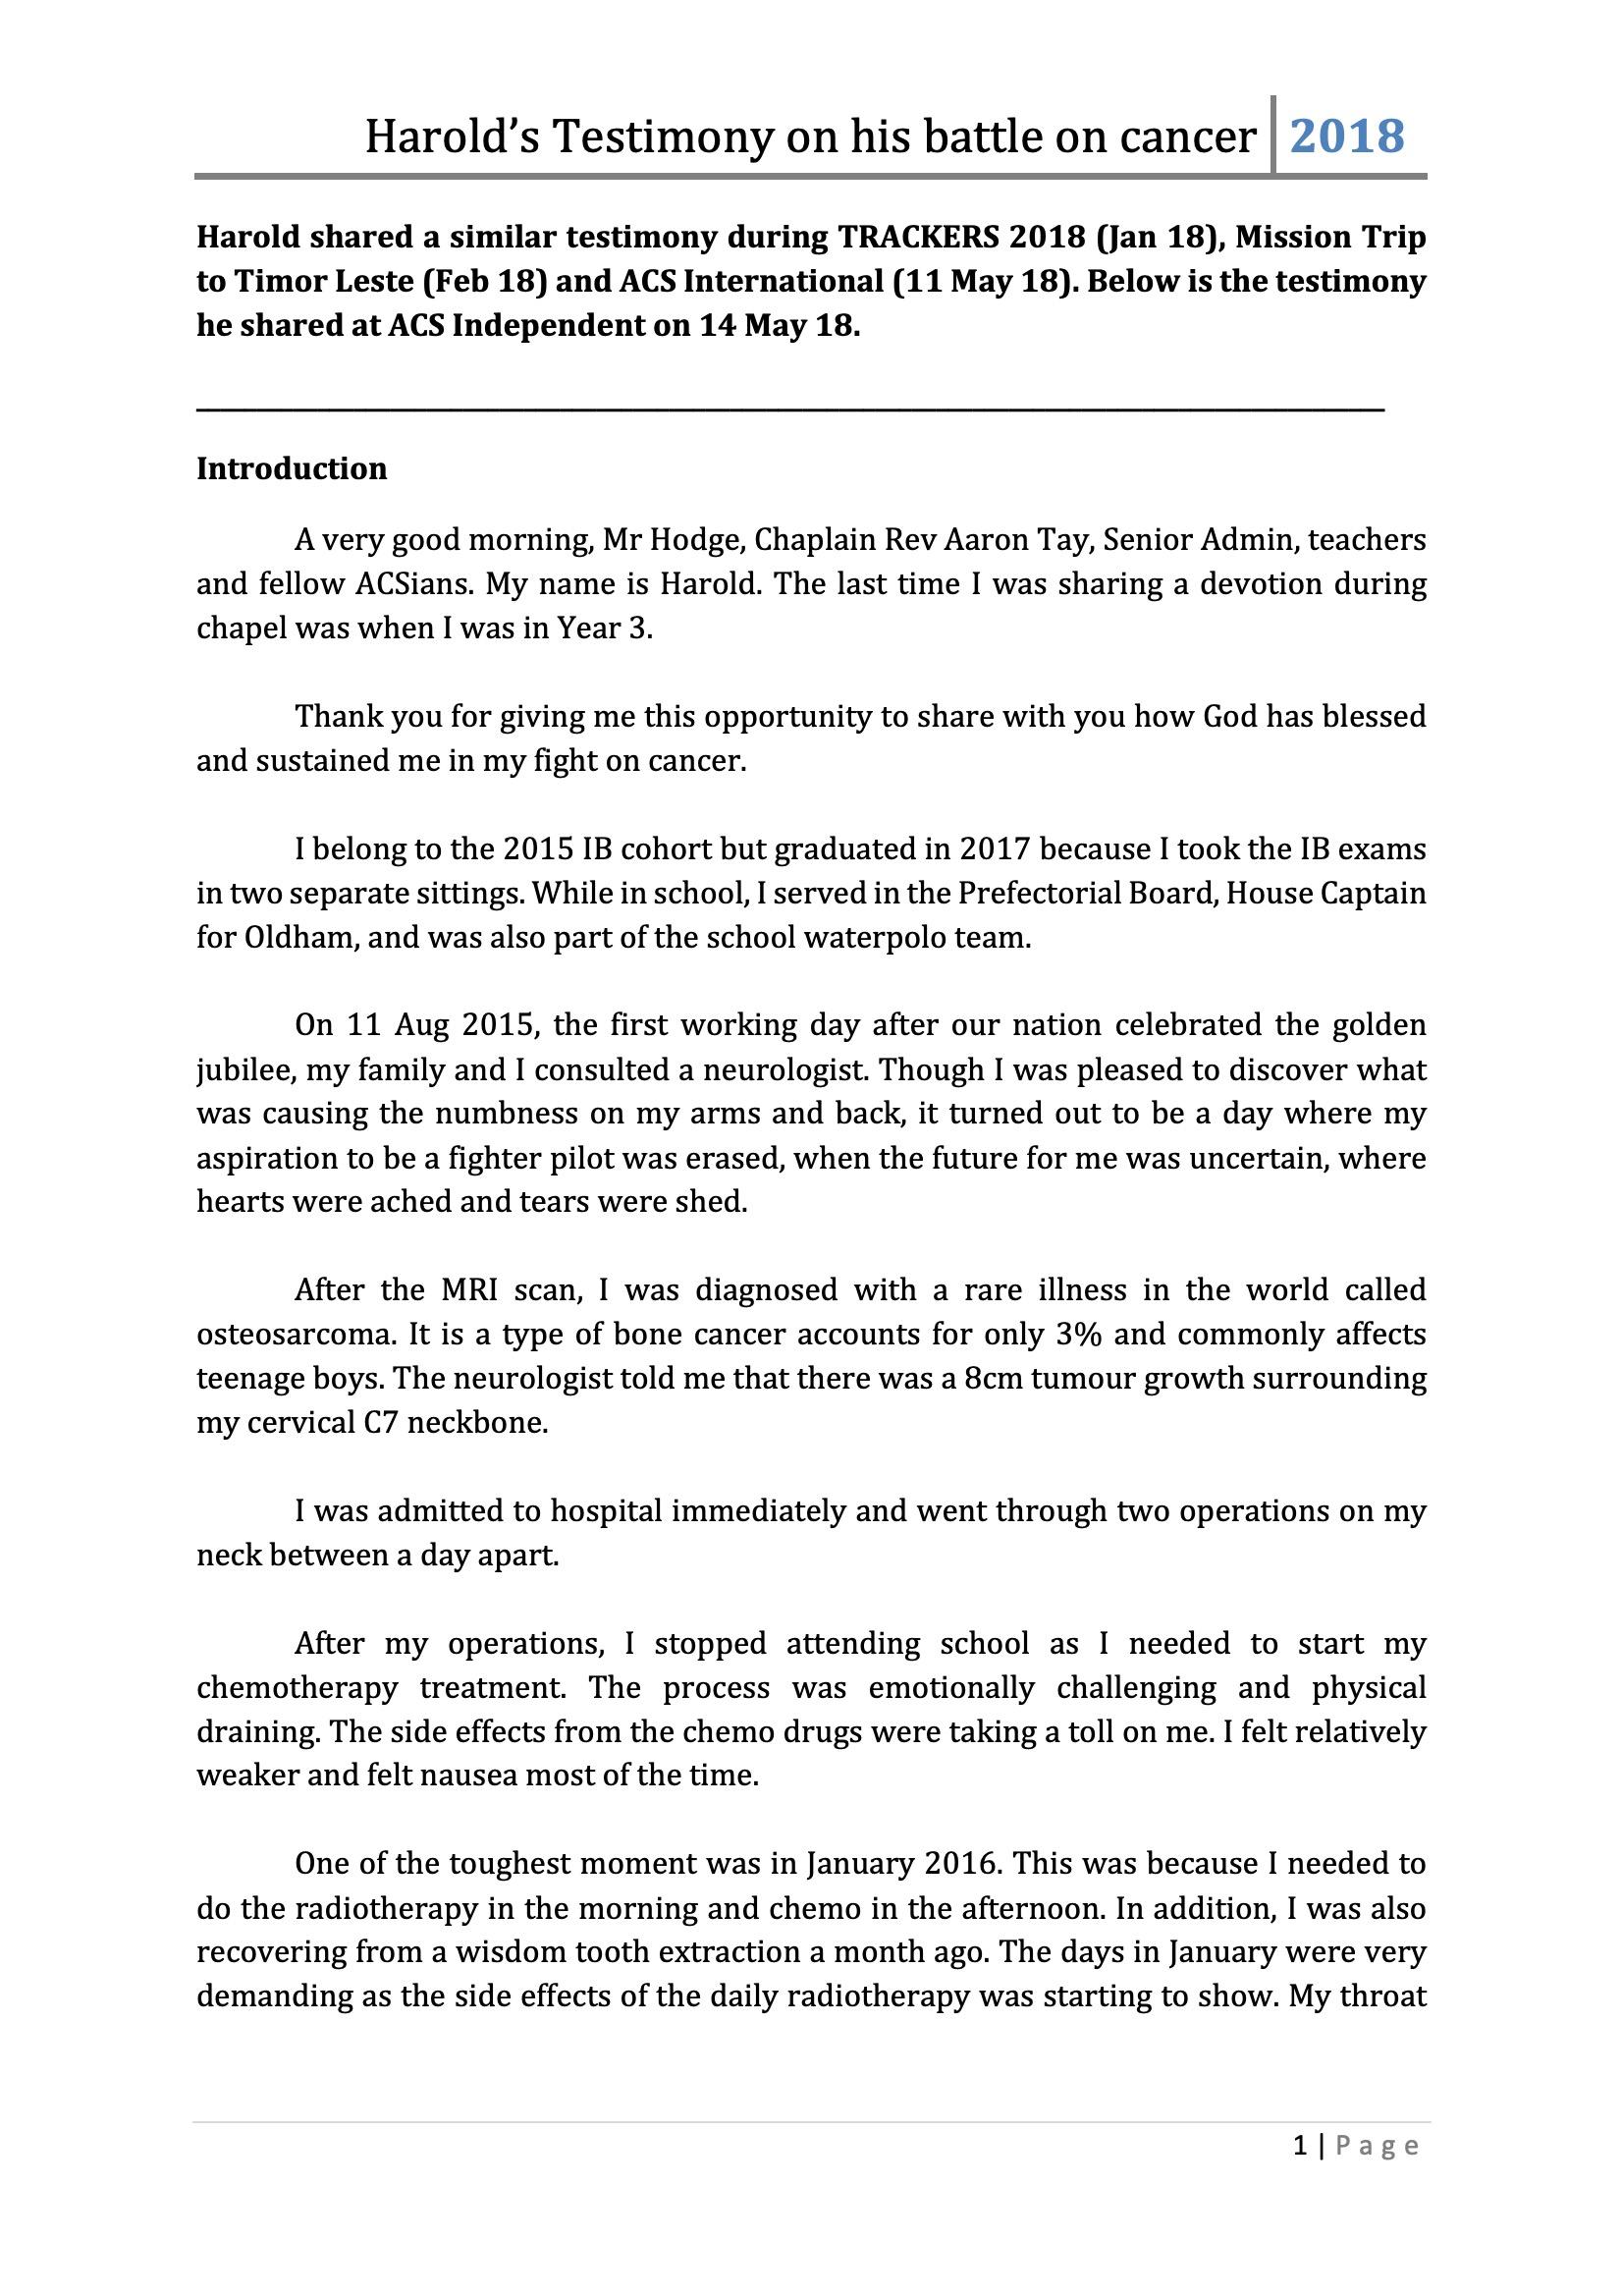 Battling sarcoma_Harold_testimony-1